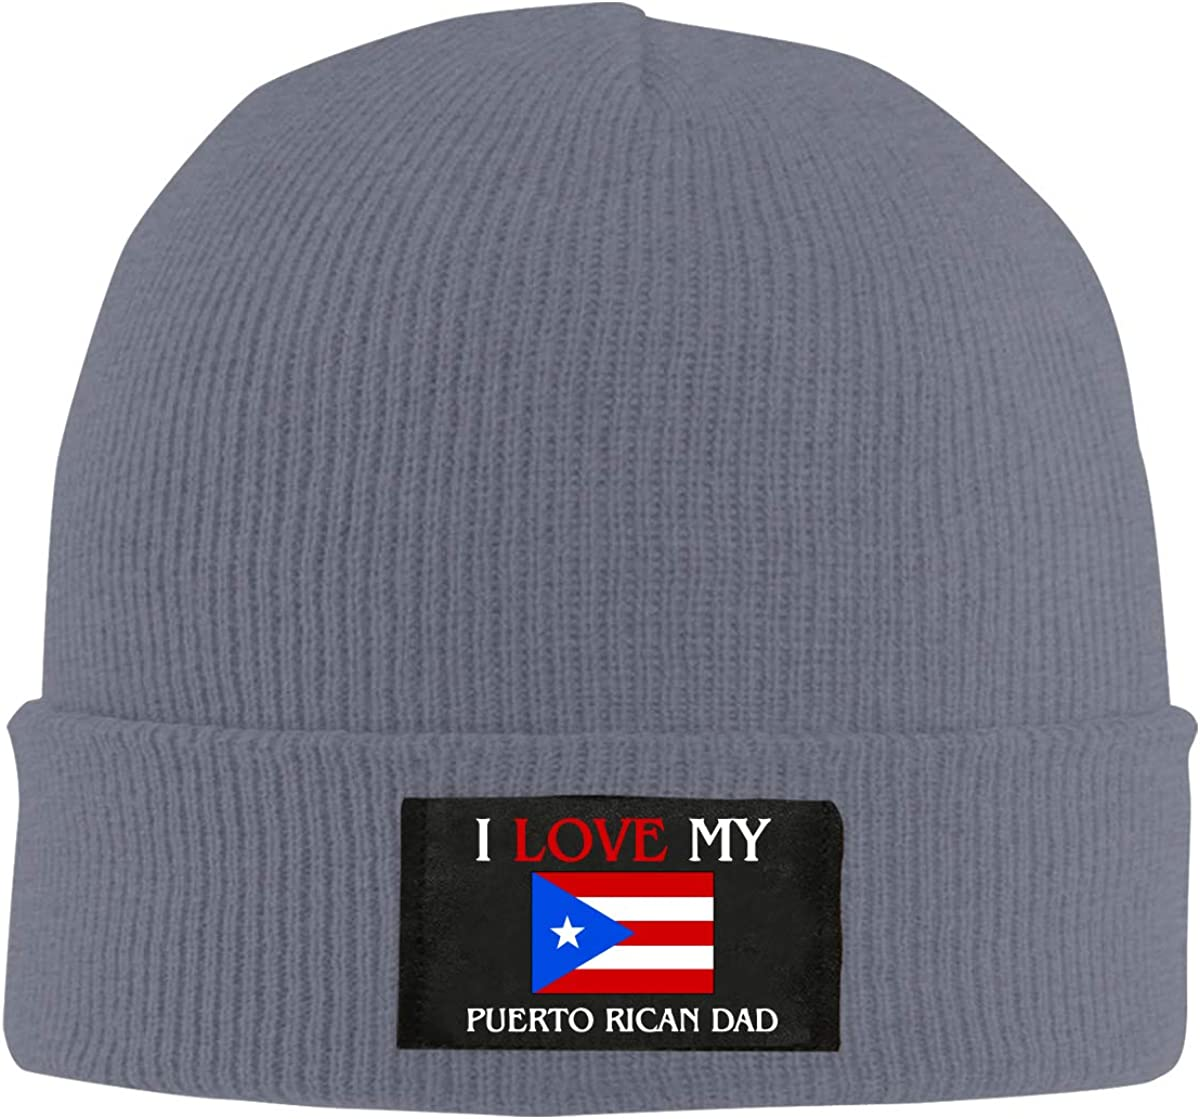 I Love My Puerto Rican Dad Unisex Knitted Hat Winter Warm Fleece Beanie Hat